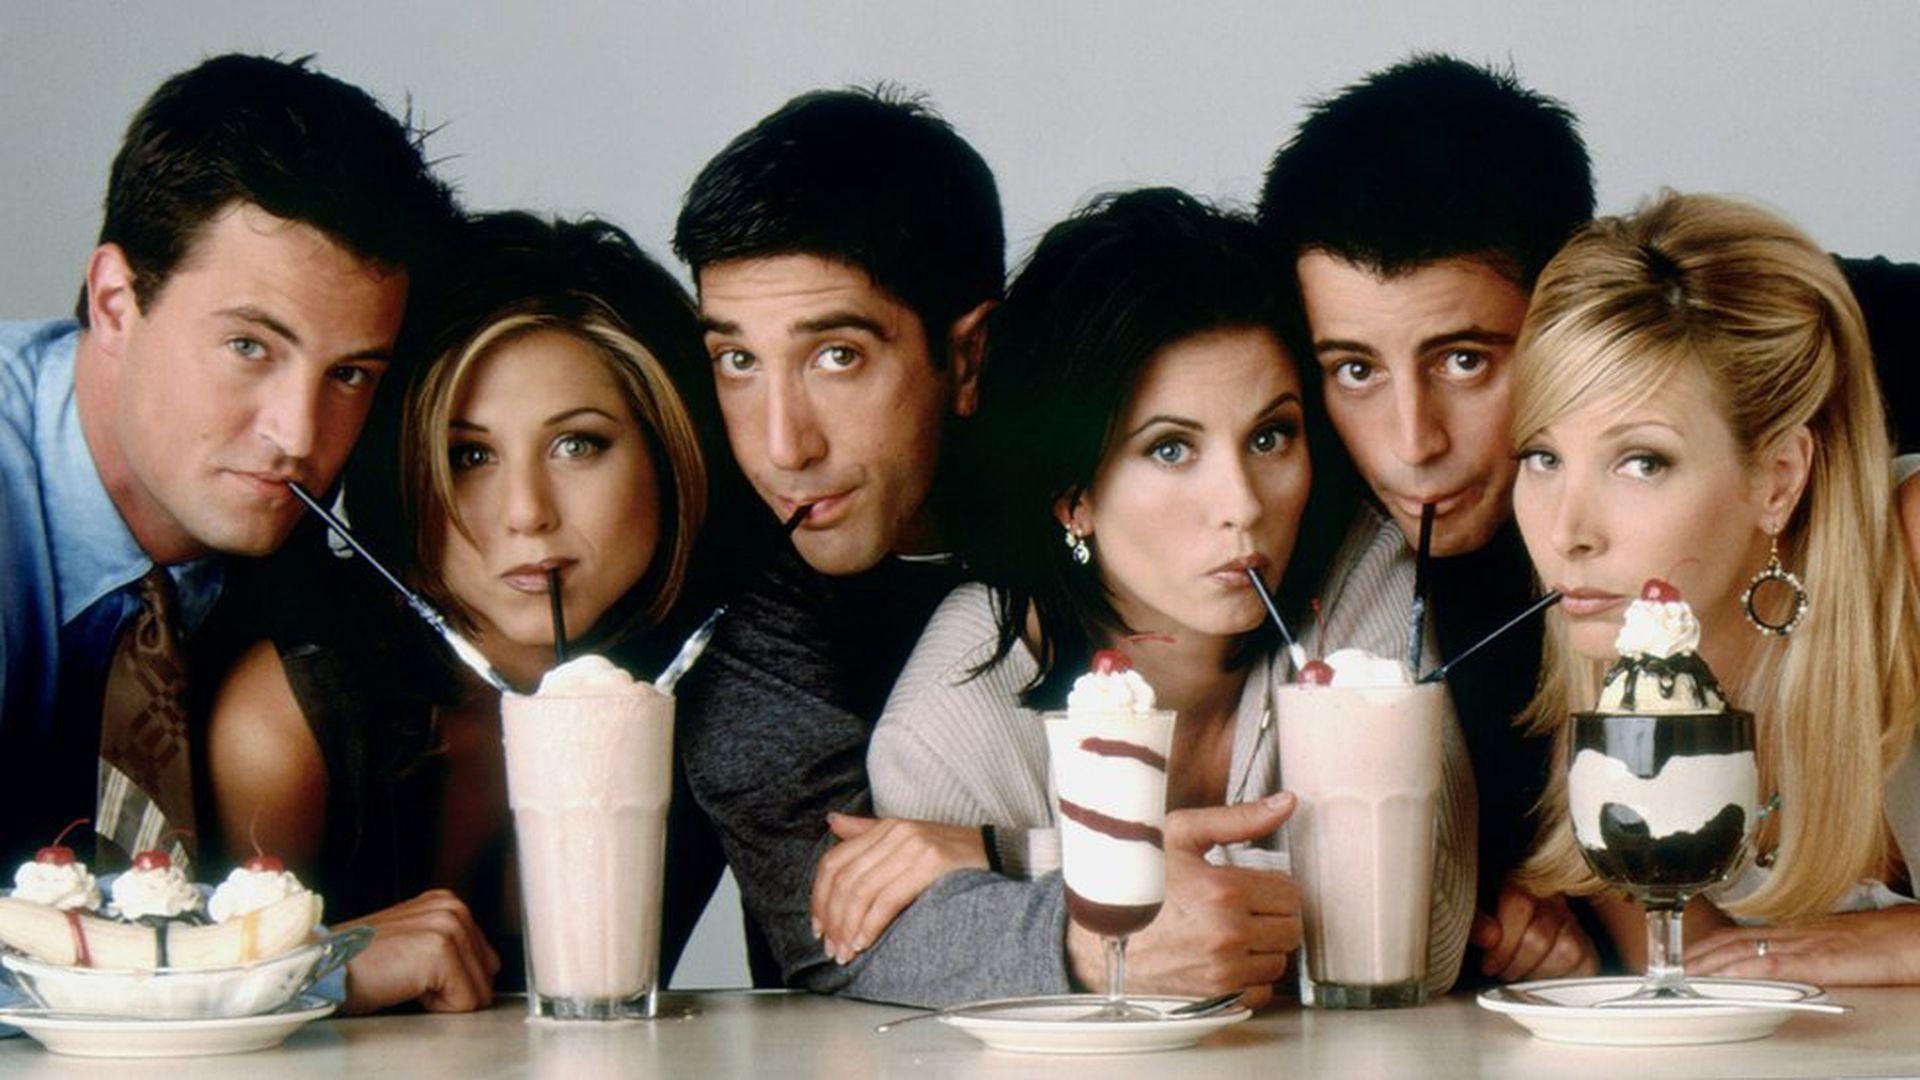 El exitoso elenco de Friends: Chandler Bing (Matthew Perry), Rachel Green (Jennifer Aniston), (doctor) Ross Geller (David Schwimmer), Mónica Geller (Courteney Cox), Joey Tribbiani (Matt LeBlanc) y Phoebe Buffay (Lisa Kudrow).